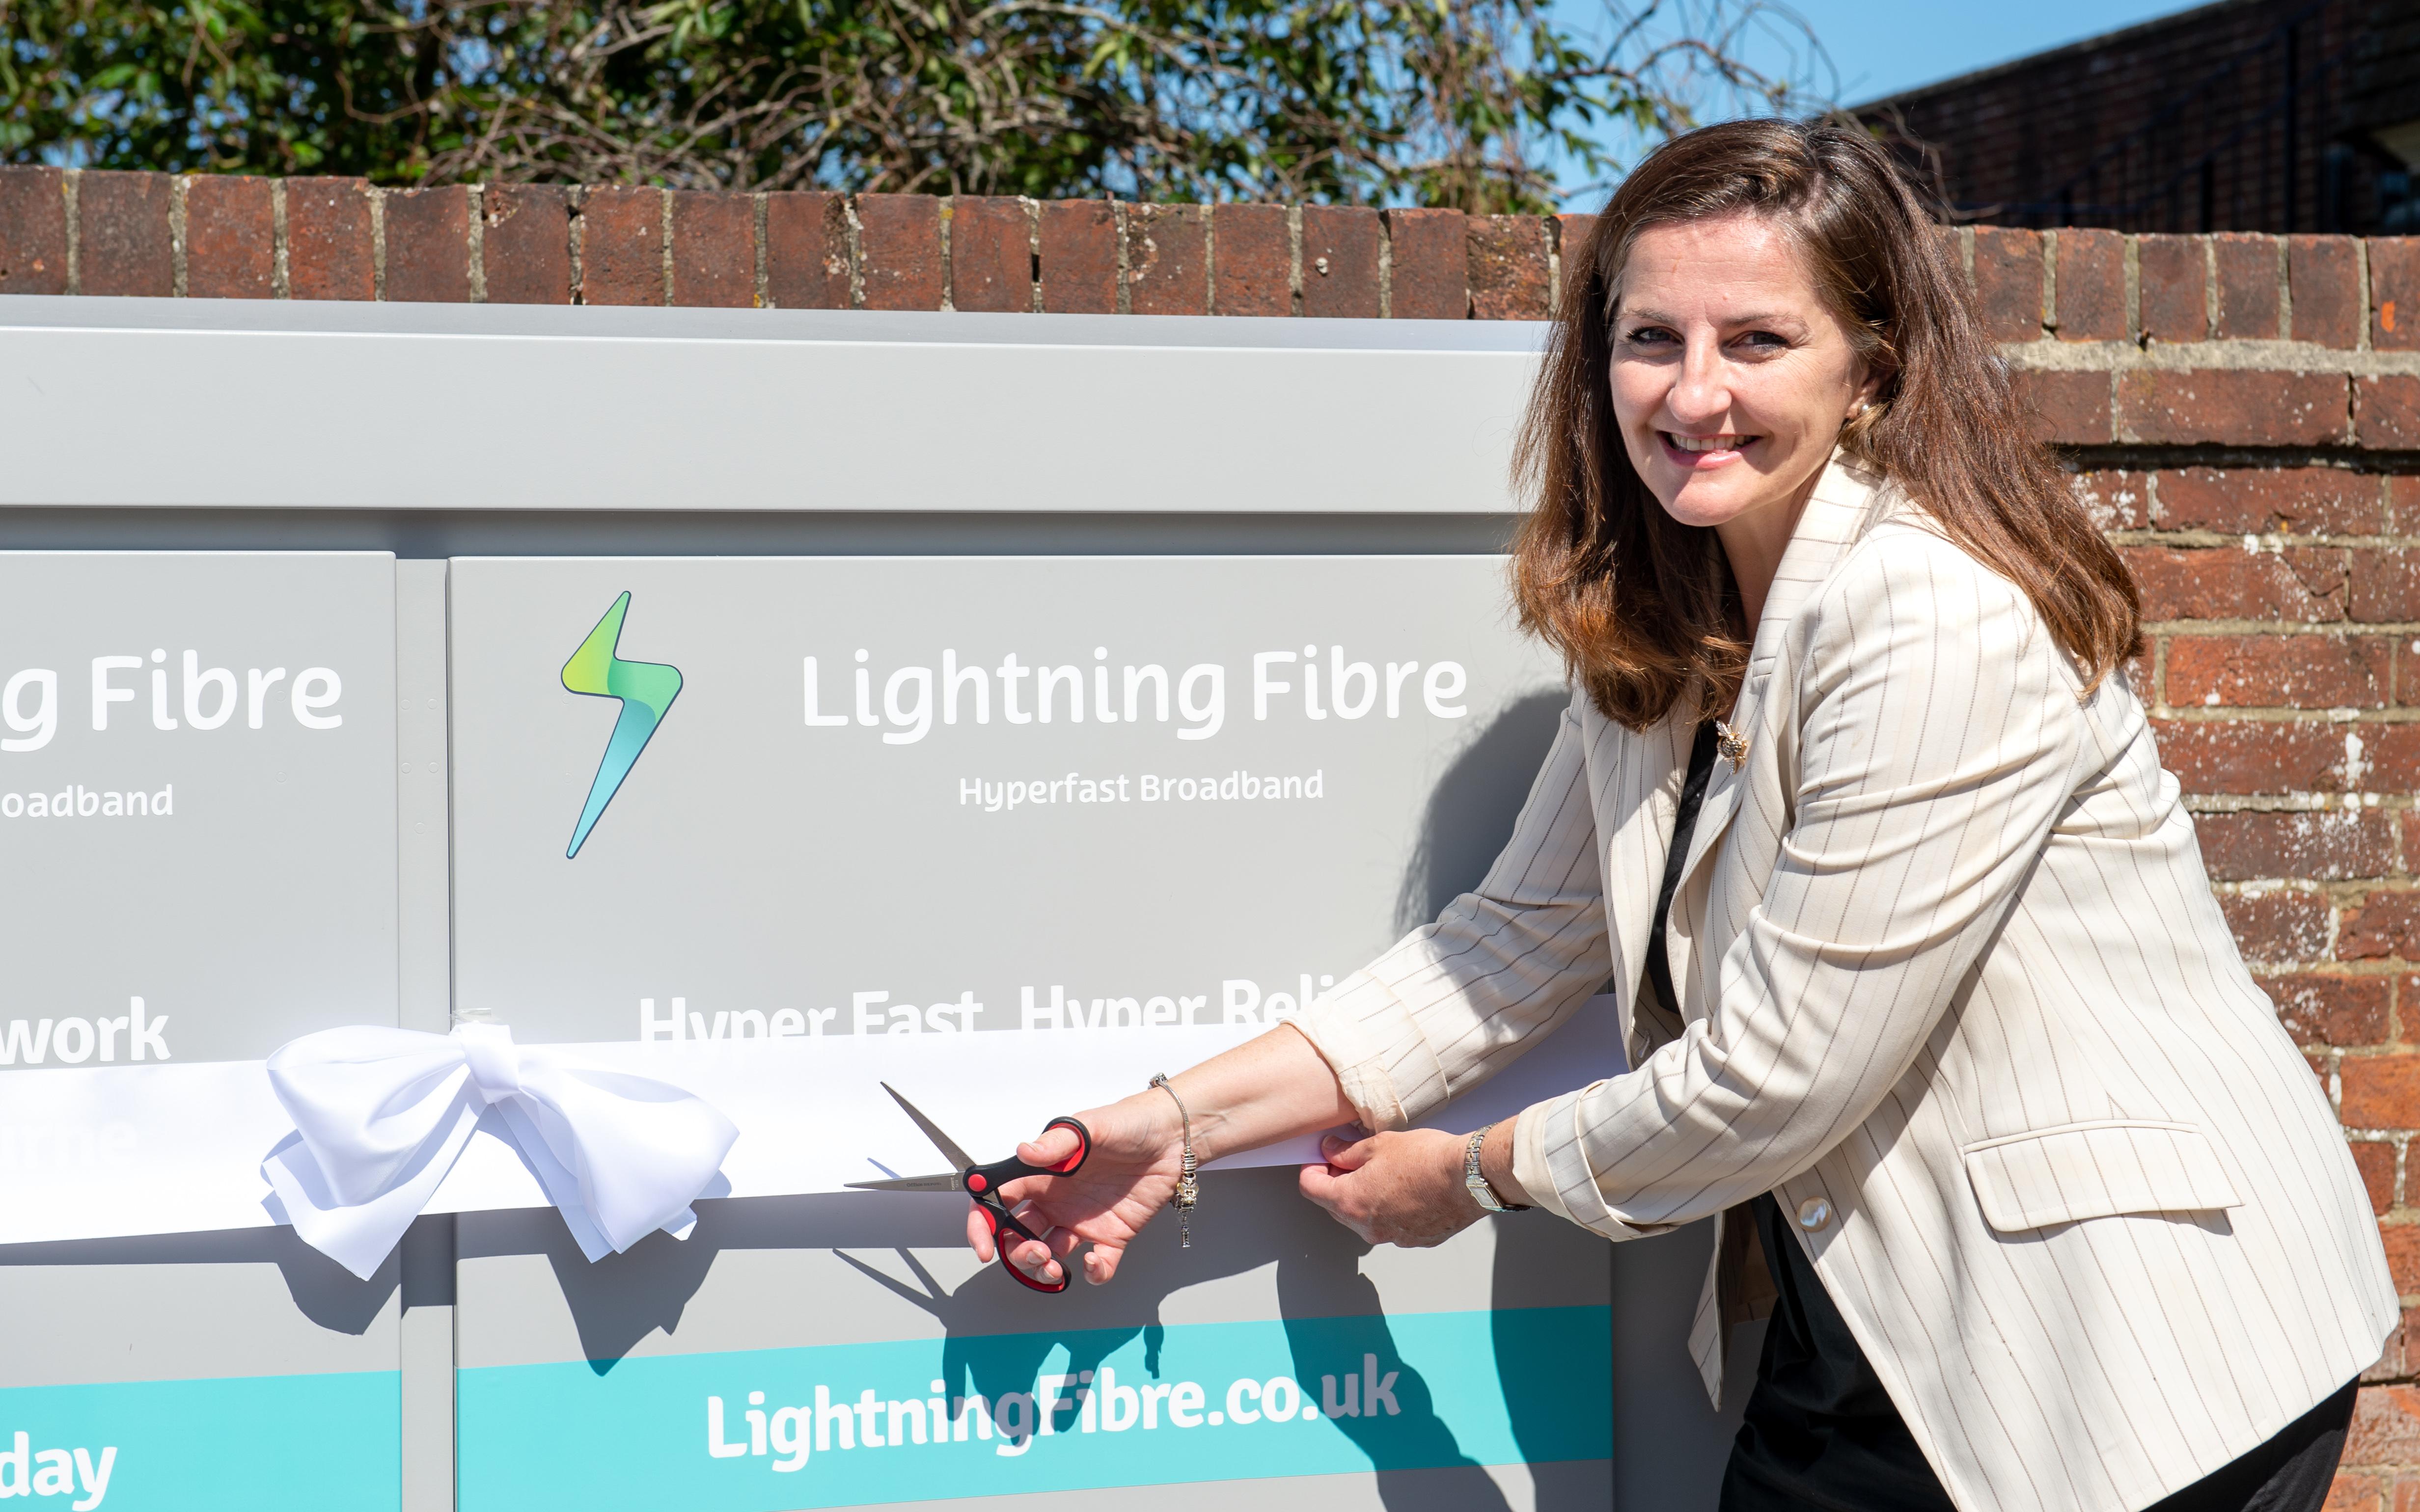 Caroline Ansell, Eastbourne MP unveils Lightning Fibre's latest Full Fibre broadband area, Old Town